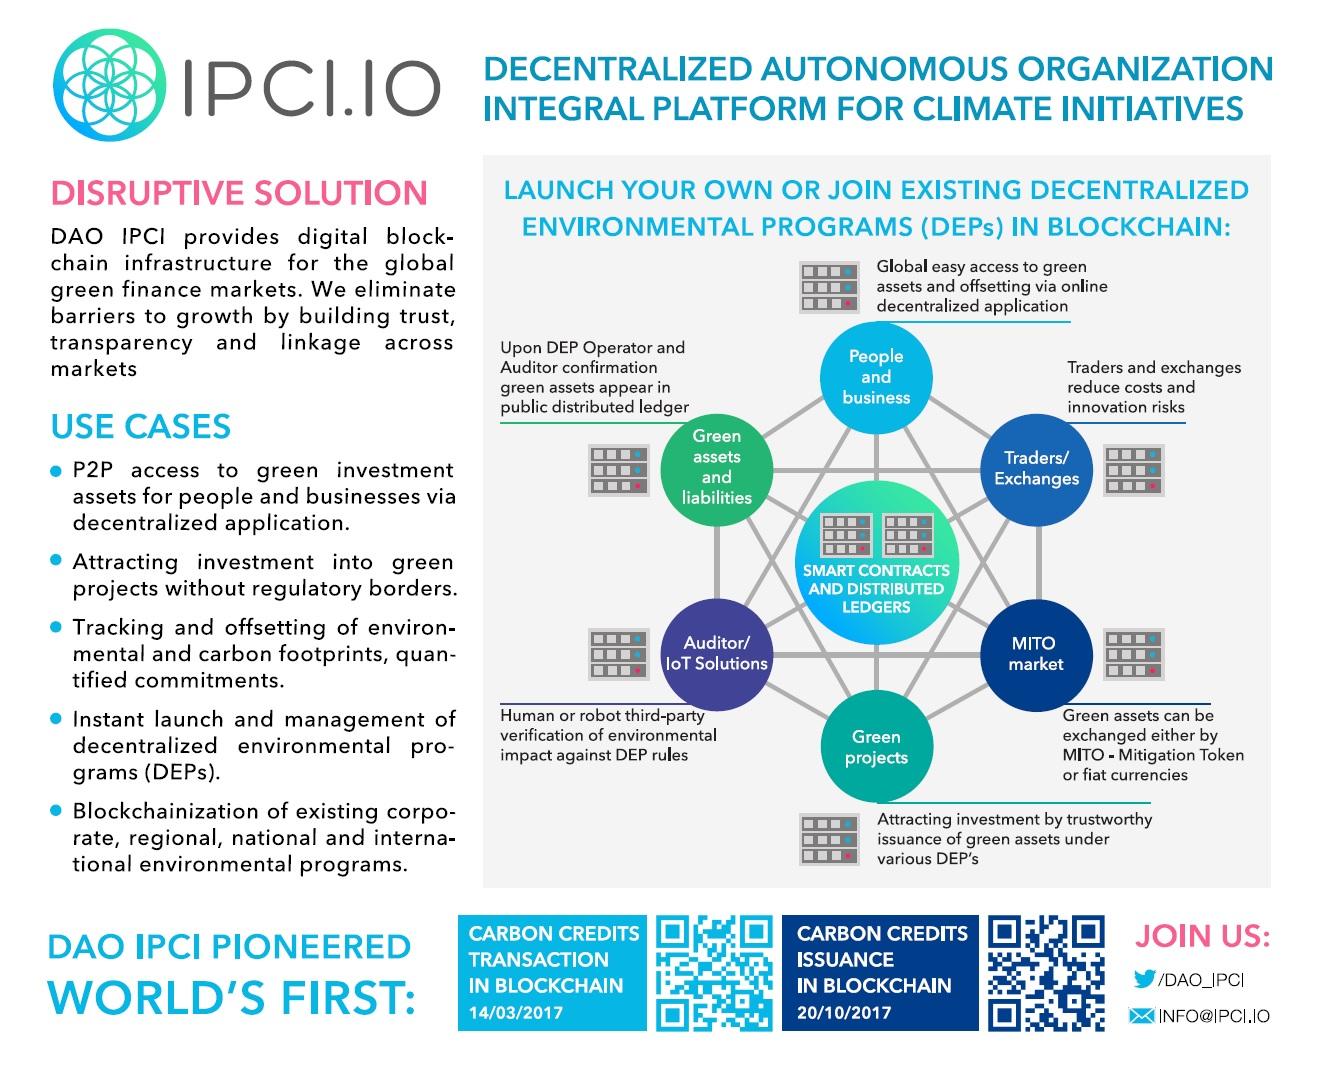 cop23 poster blockchain4climateaction 2 DAO IPCI